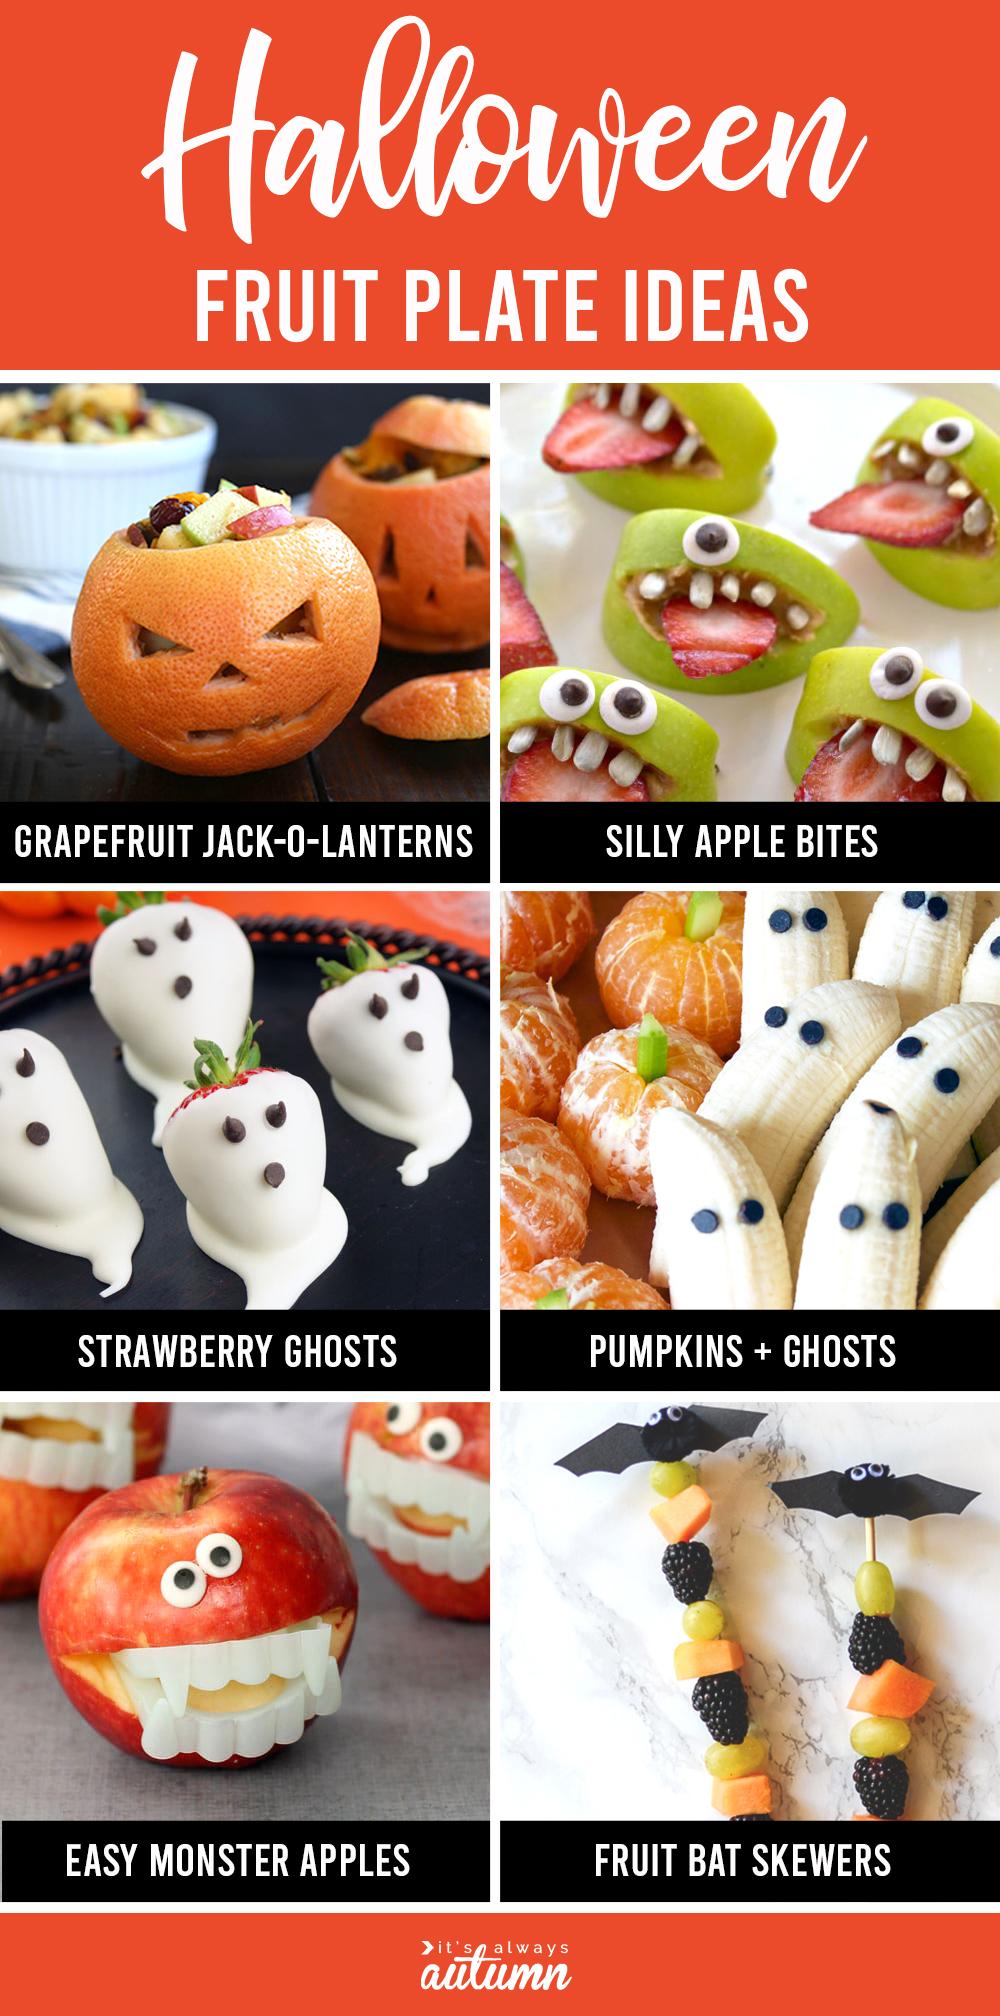 Healthy Halloween fruit plates